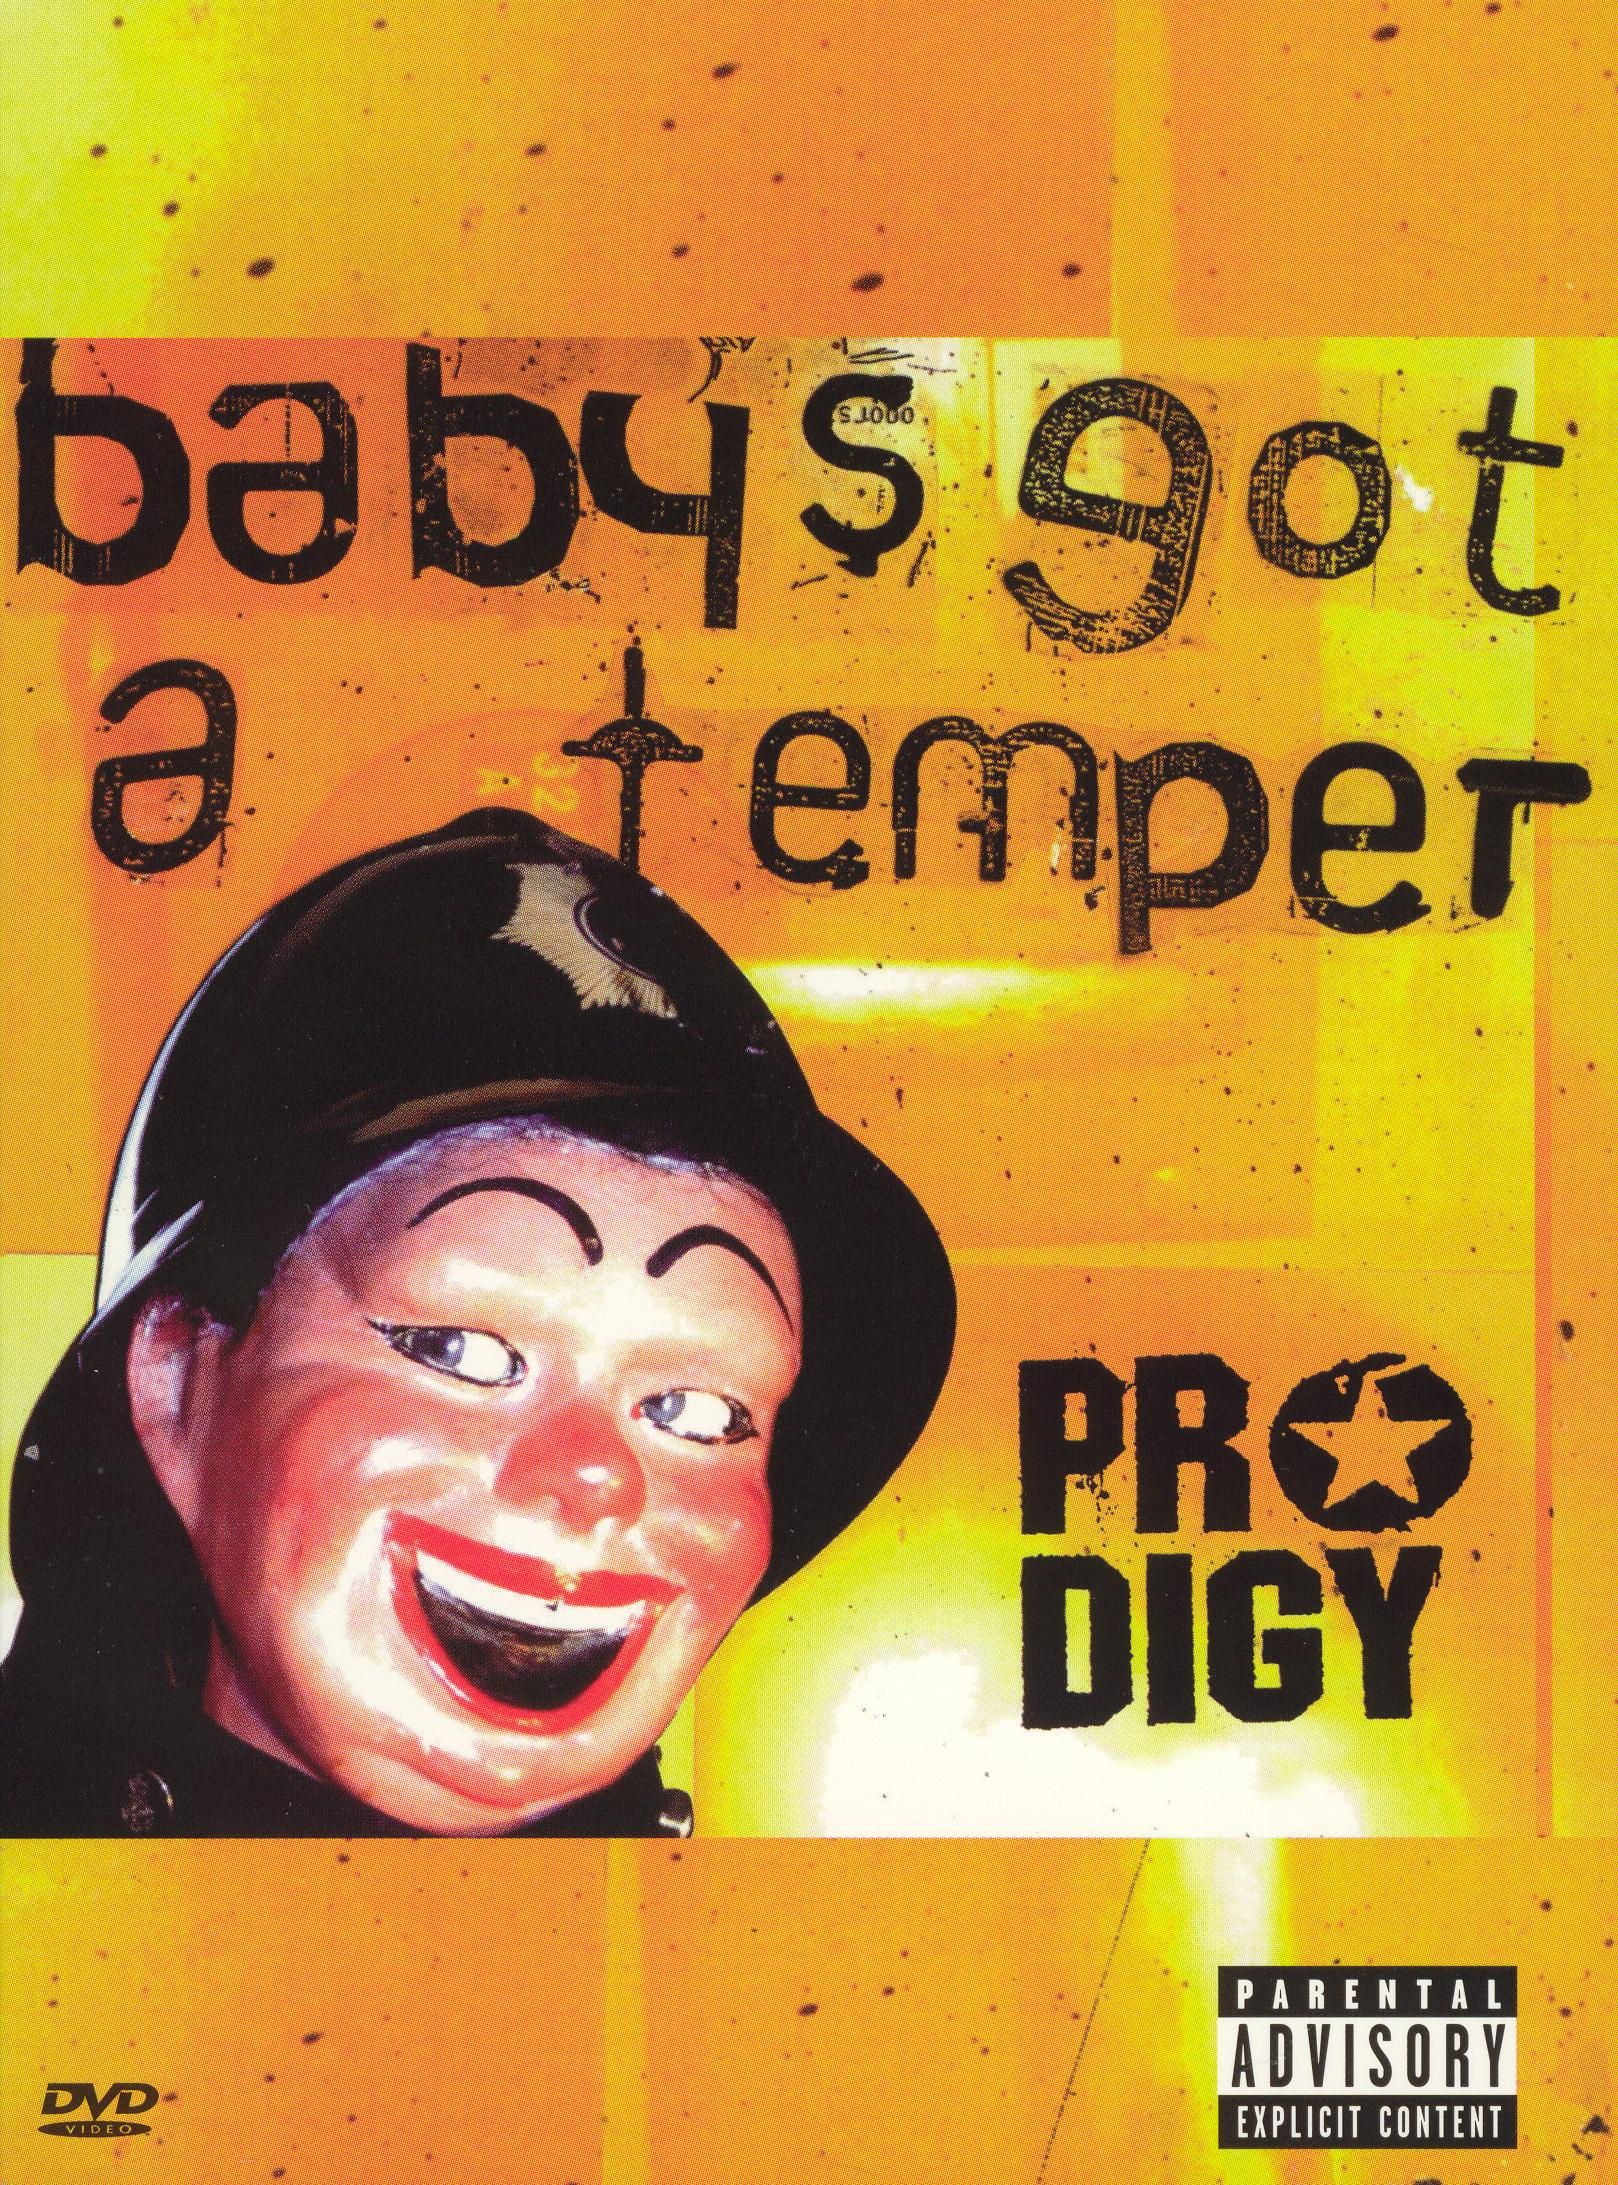 Prodigy: Baby's Got a Temper  [DVD Single]